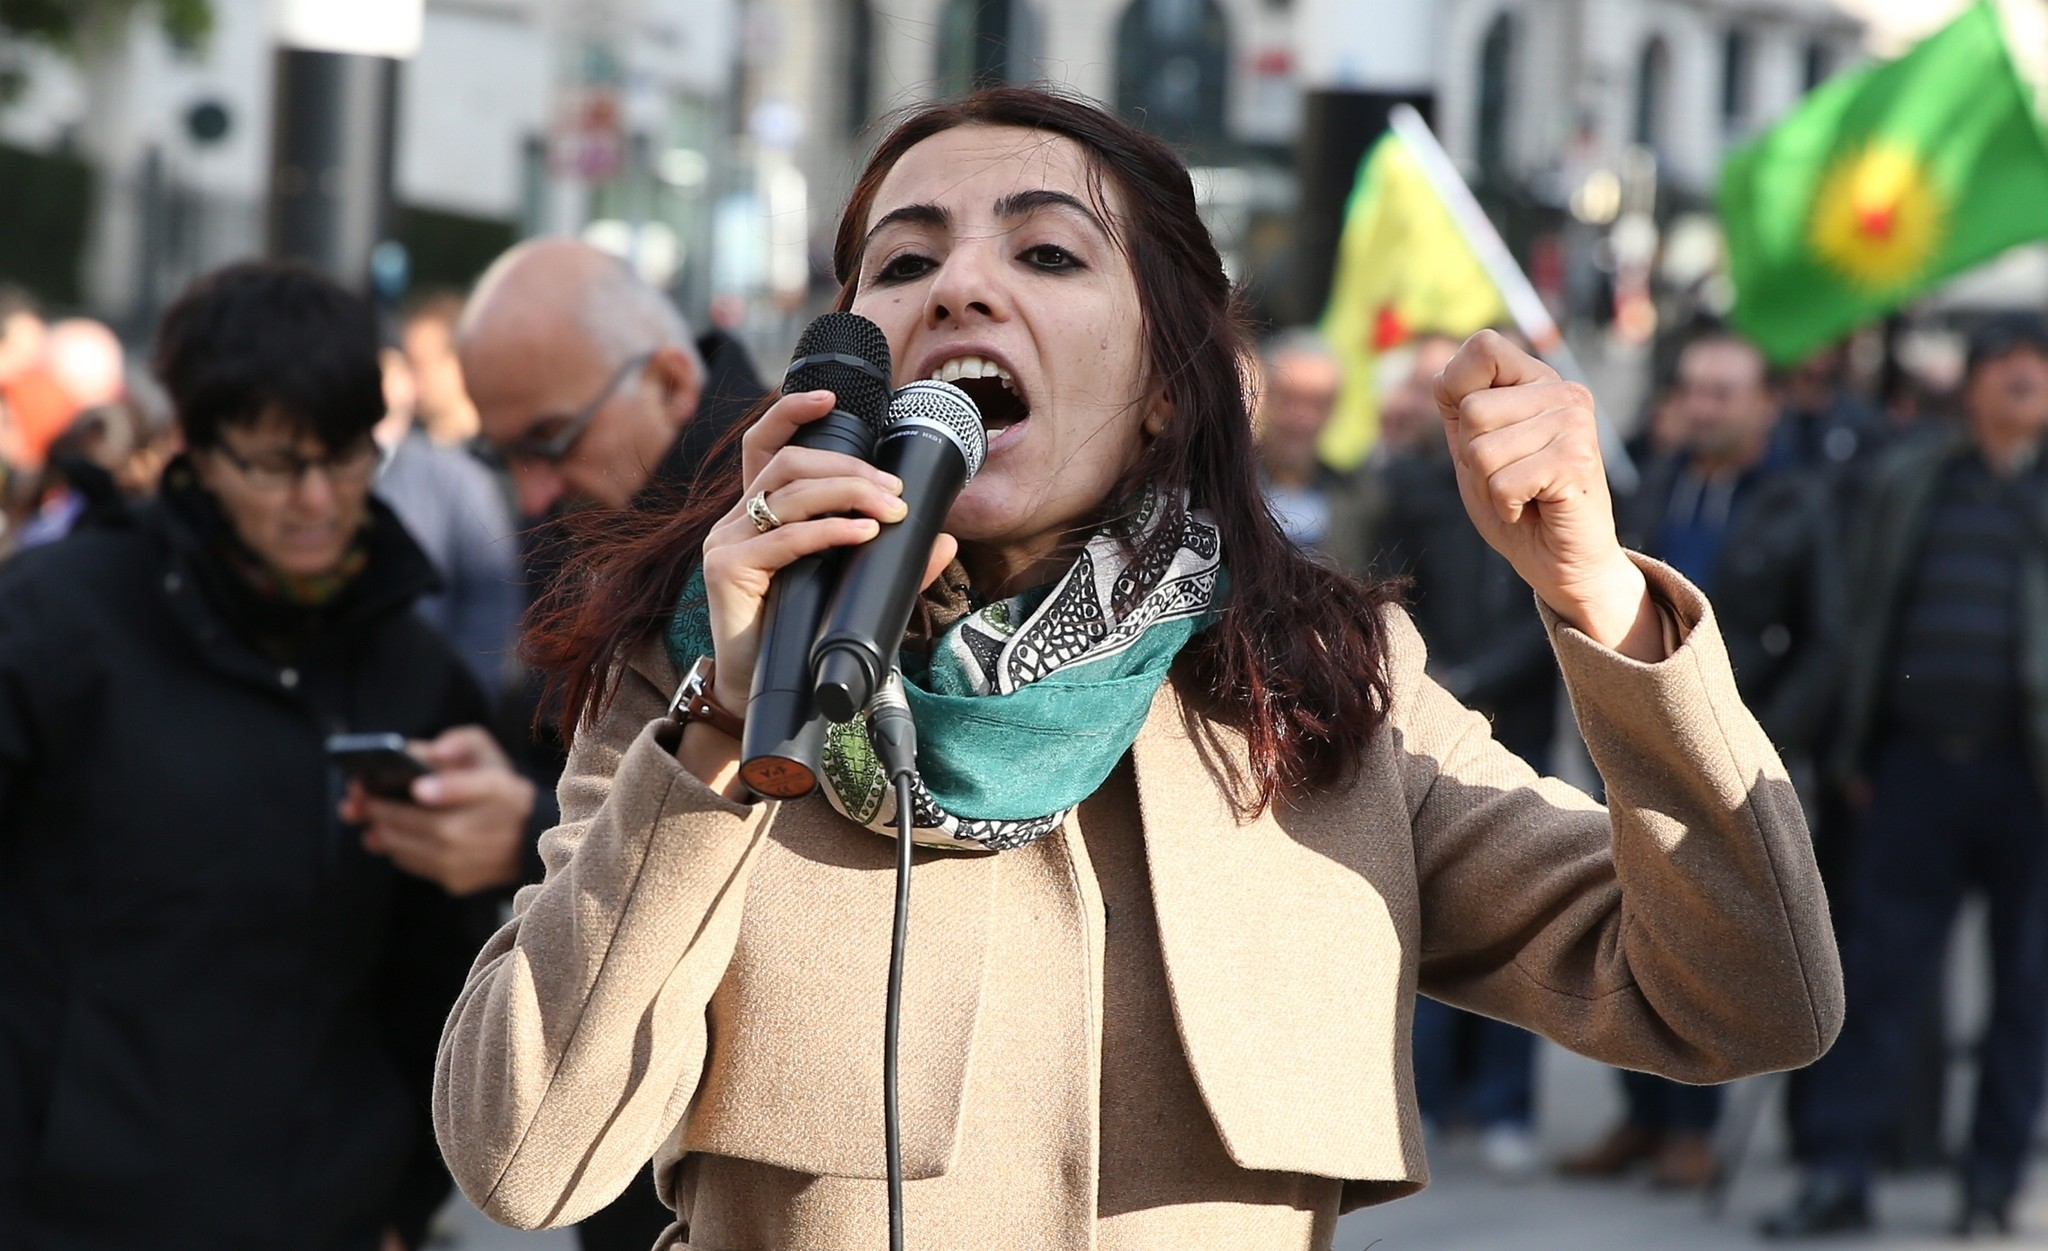 HDPu2019s Van Deputy Tuu011fba Hezer u00d6ztu00fcrk speaks at a pro-PKK protest in Belgiumu2019s capital Brussels on Saturday, November 5, 2016. (AA Photo)